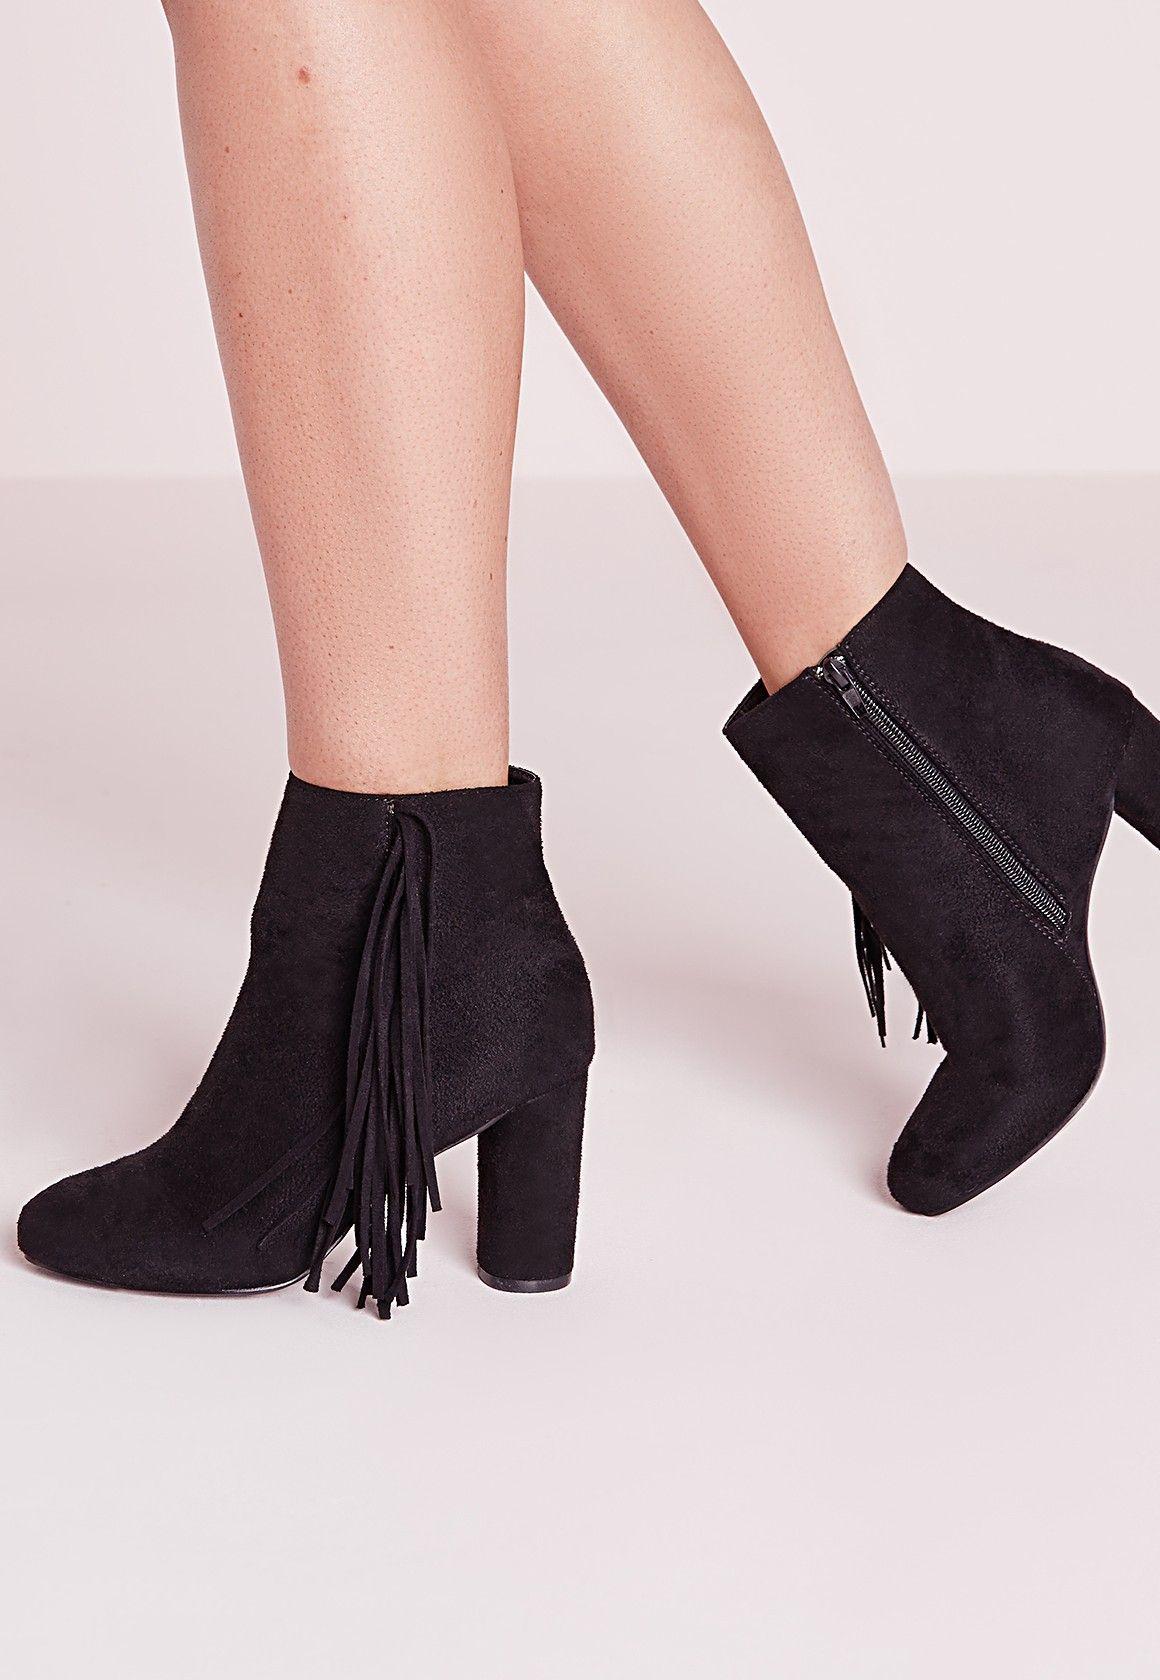 Missguided - Tassel Side Heeled Ankle Boots Black